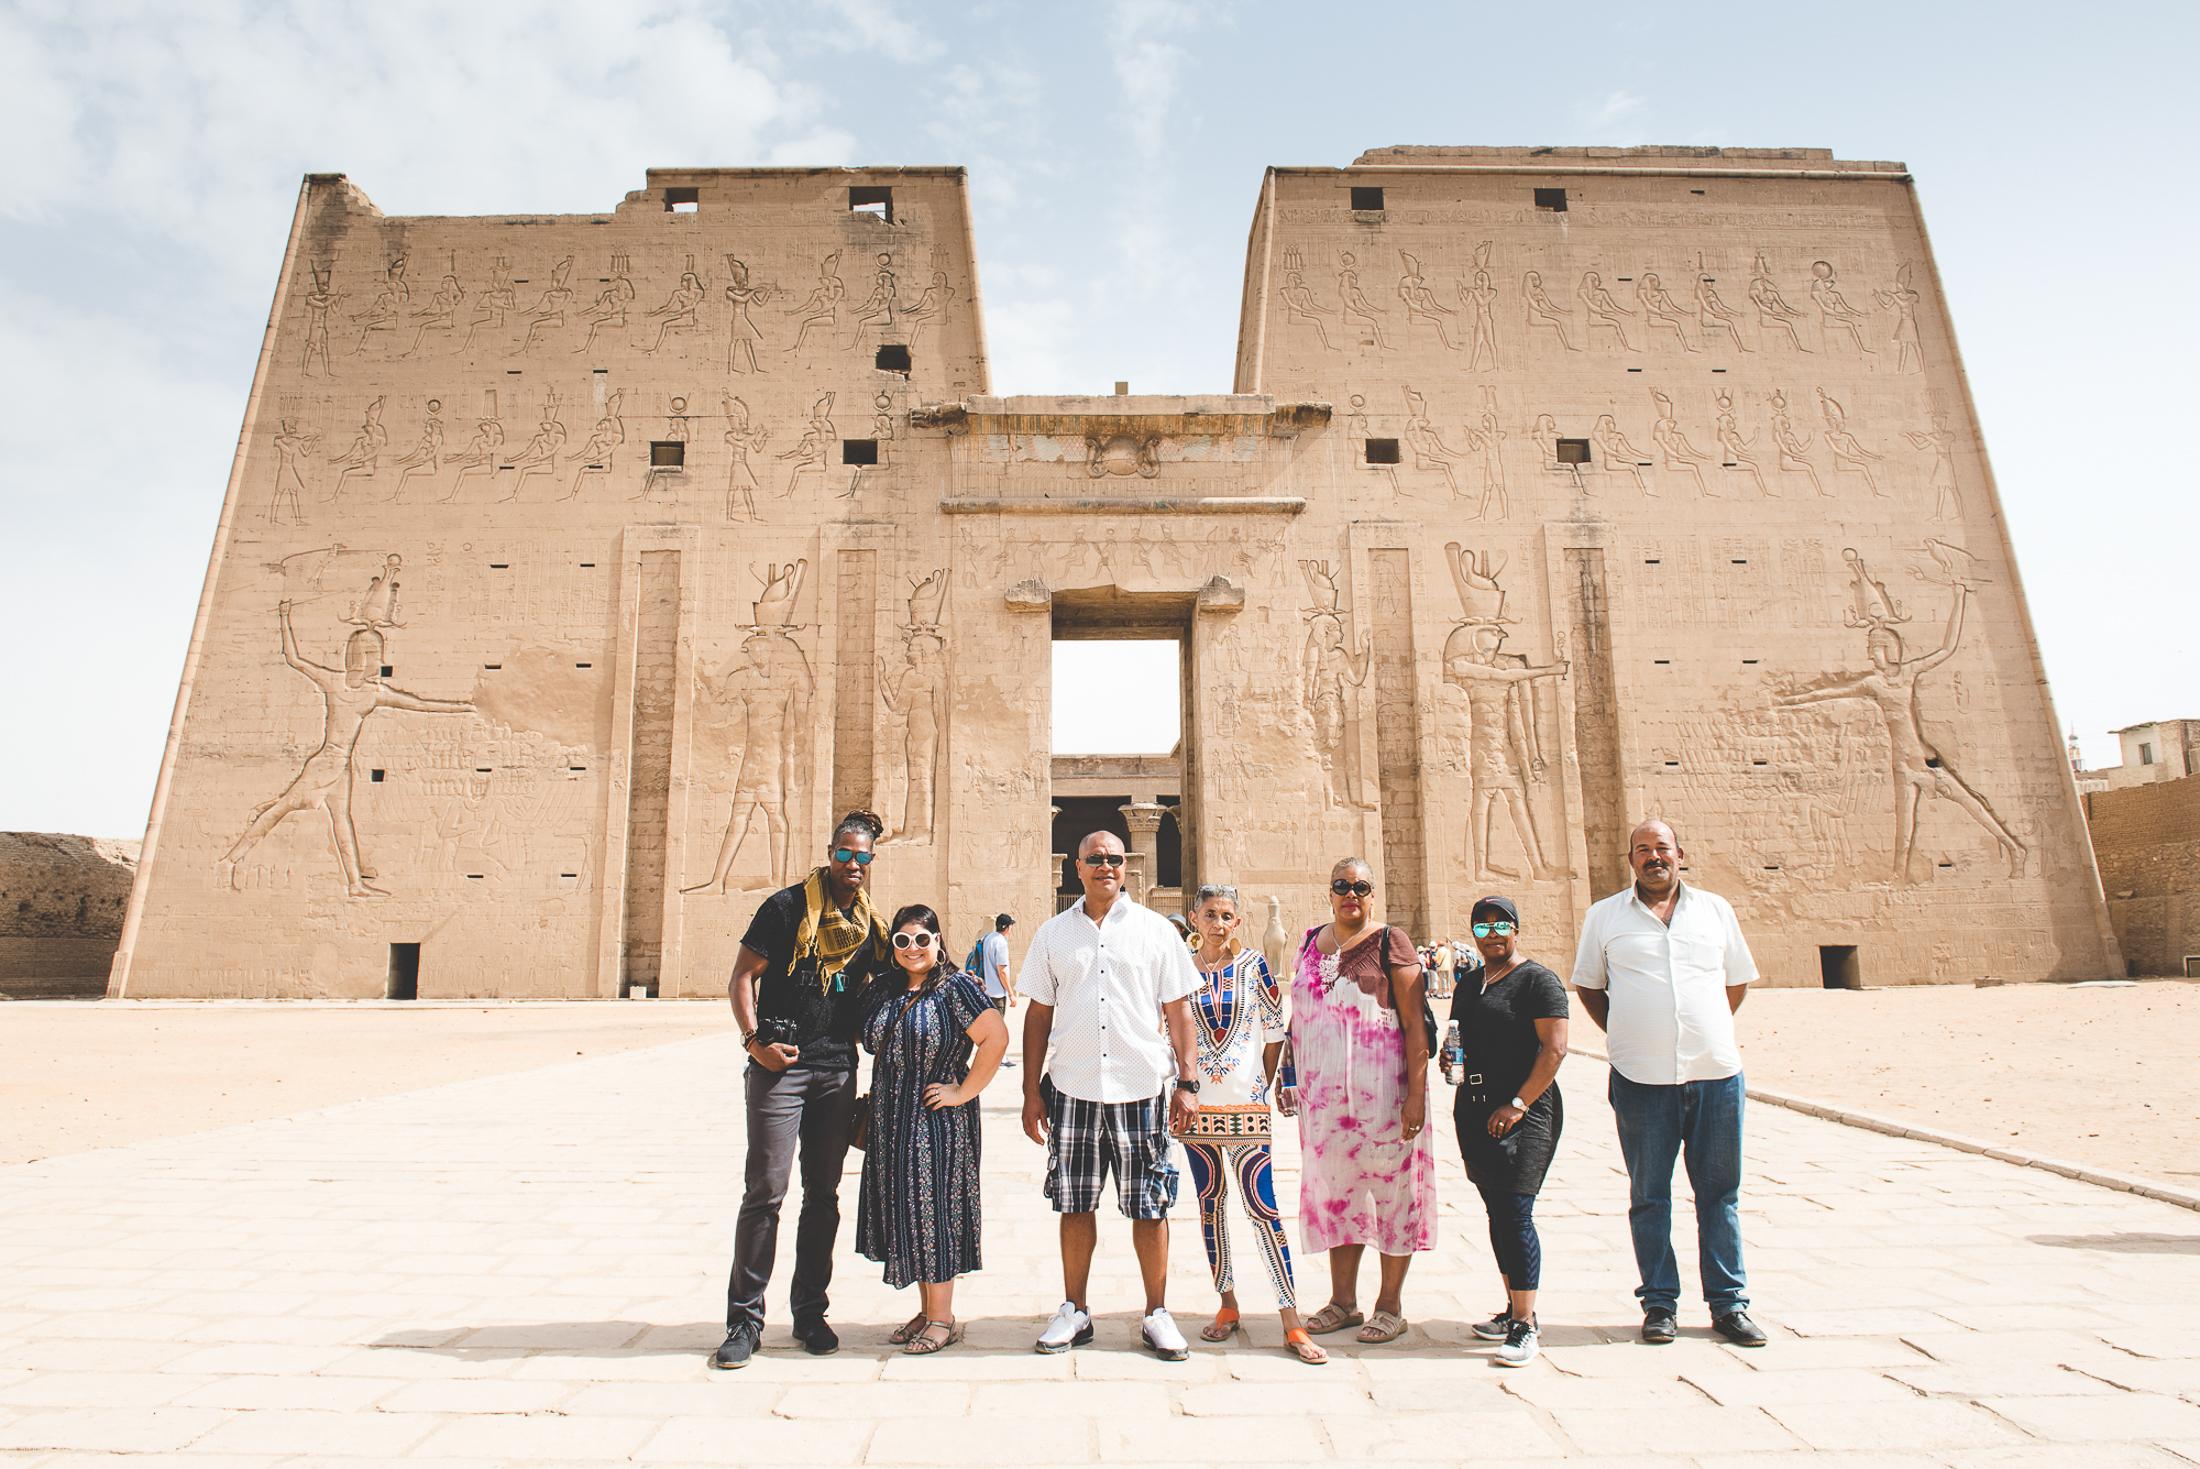 thetravelhub_egypt22.jpg